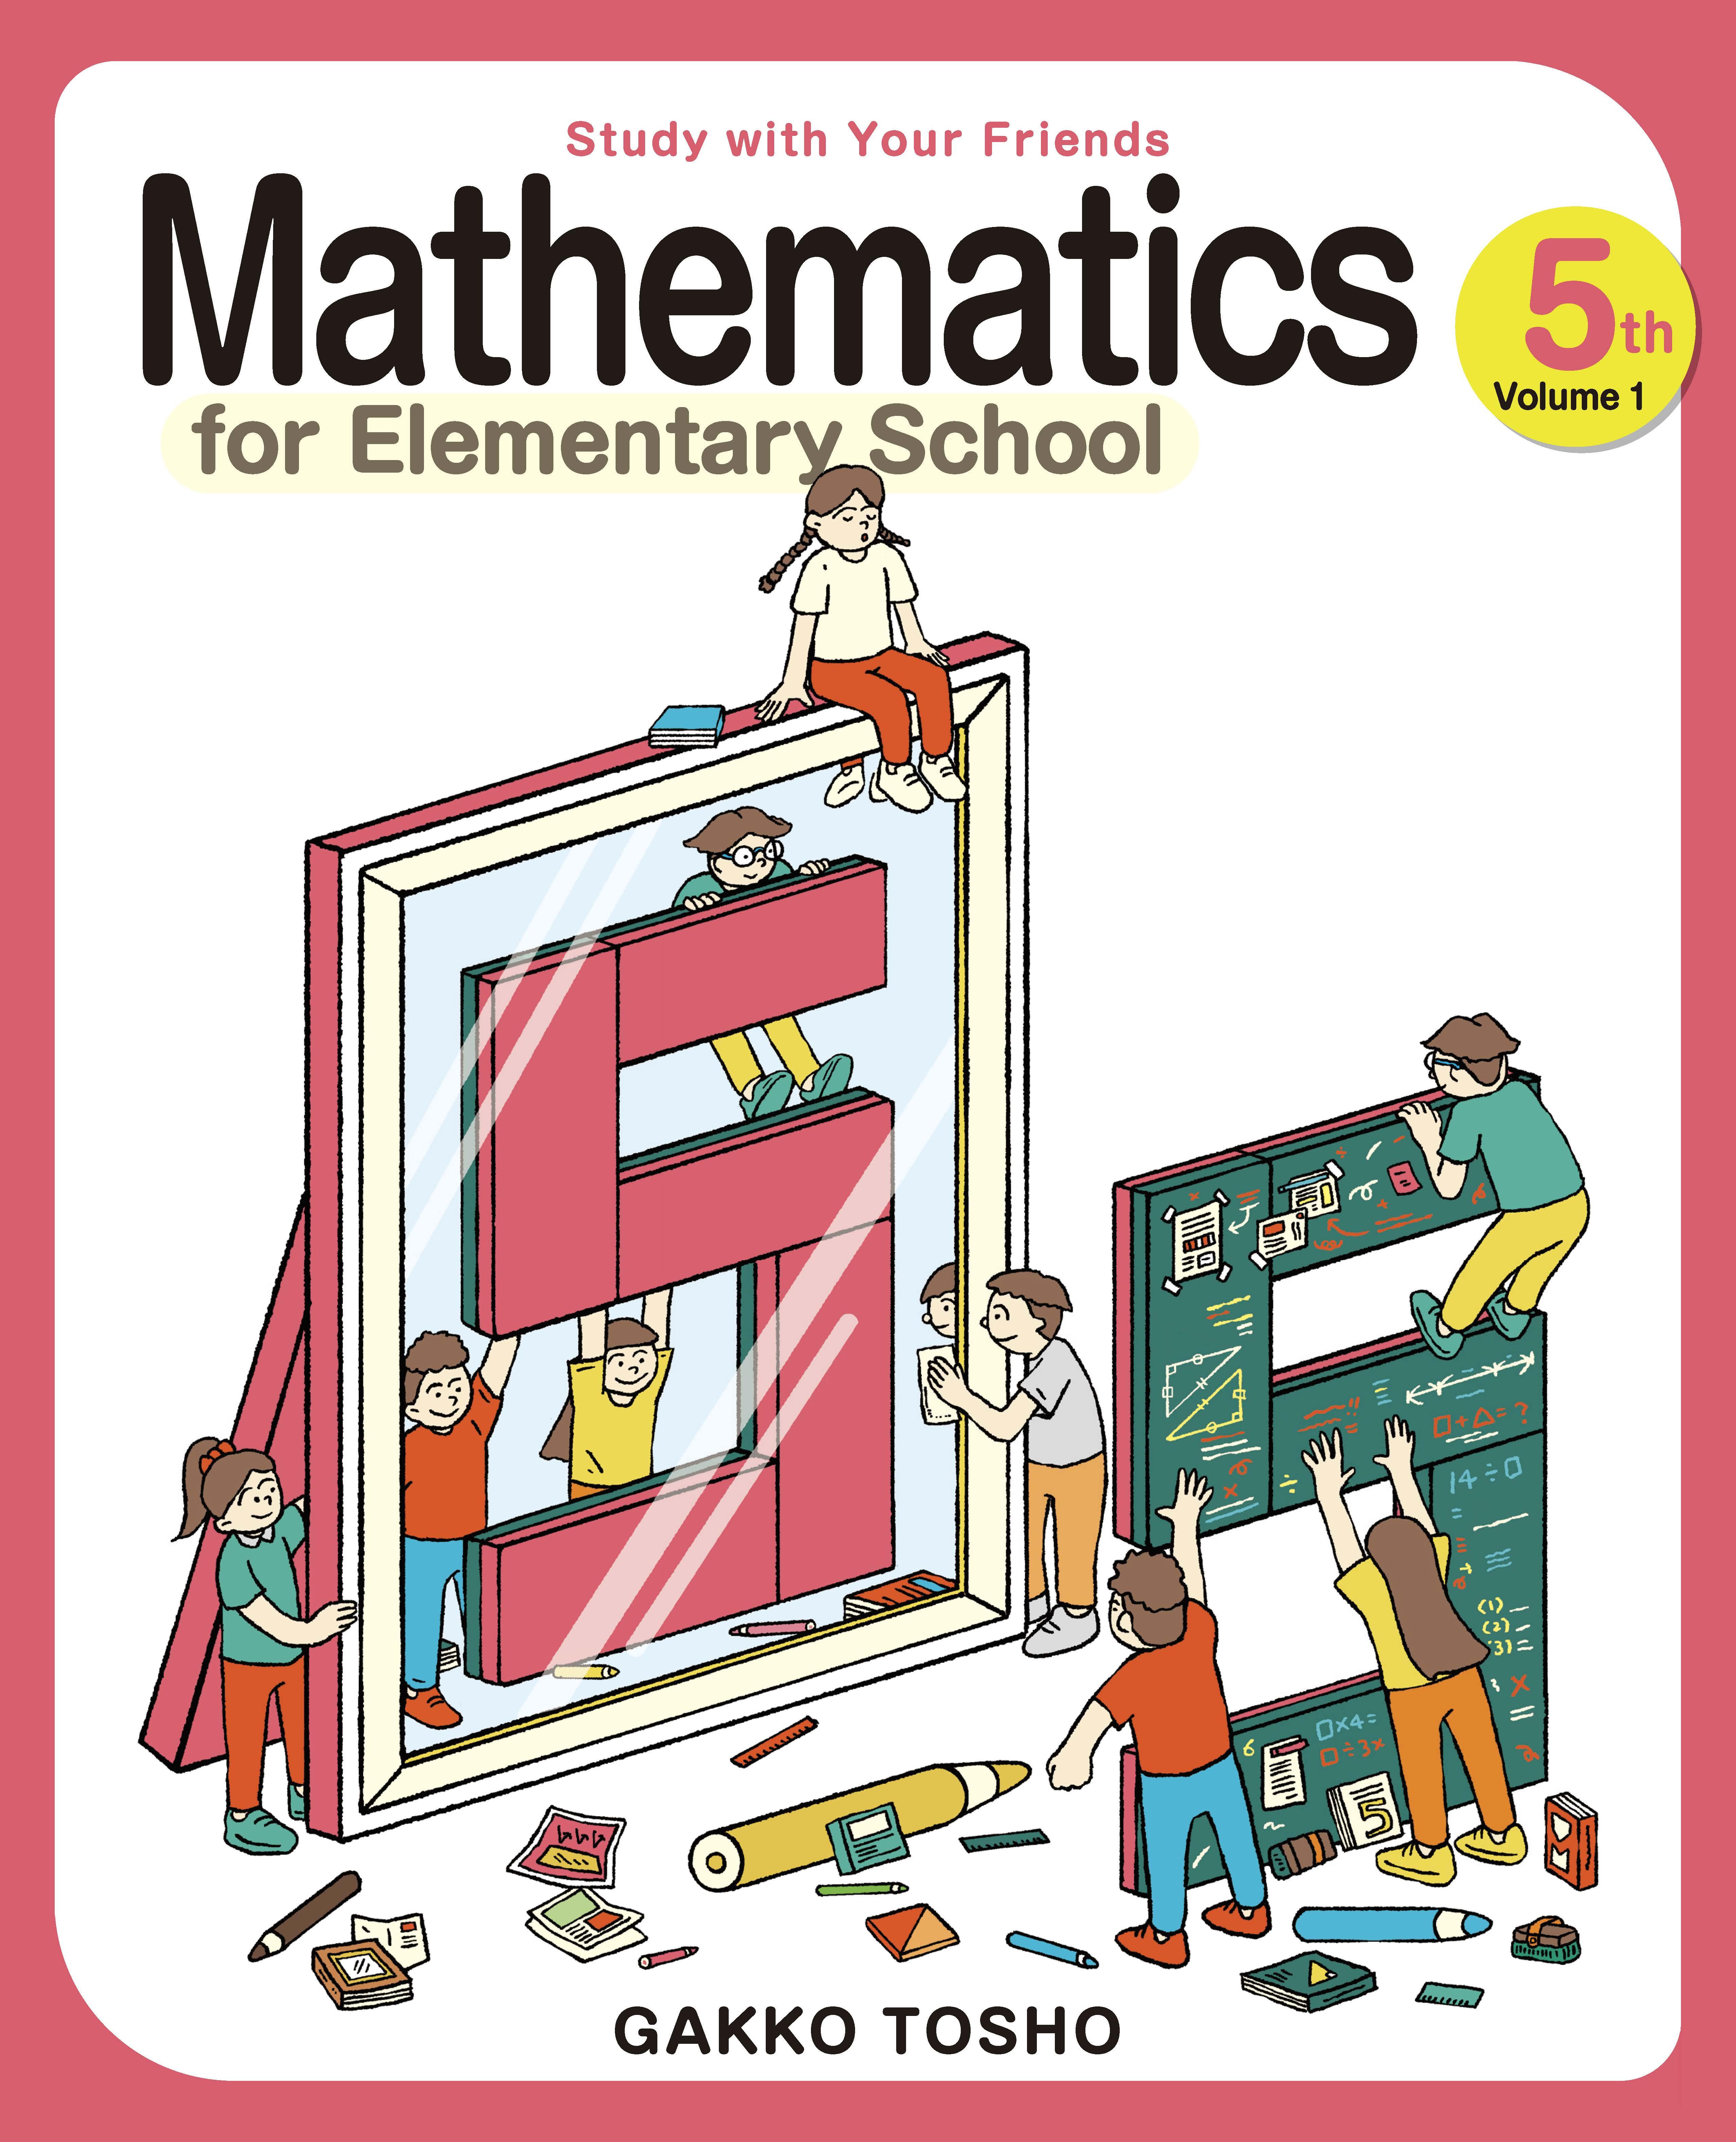 2020年版 算数英訳本 MATHEMATICS 5th Grade VOL.1